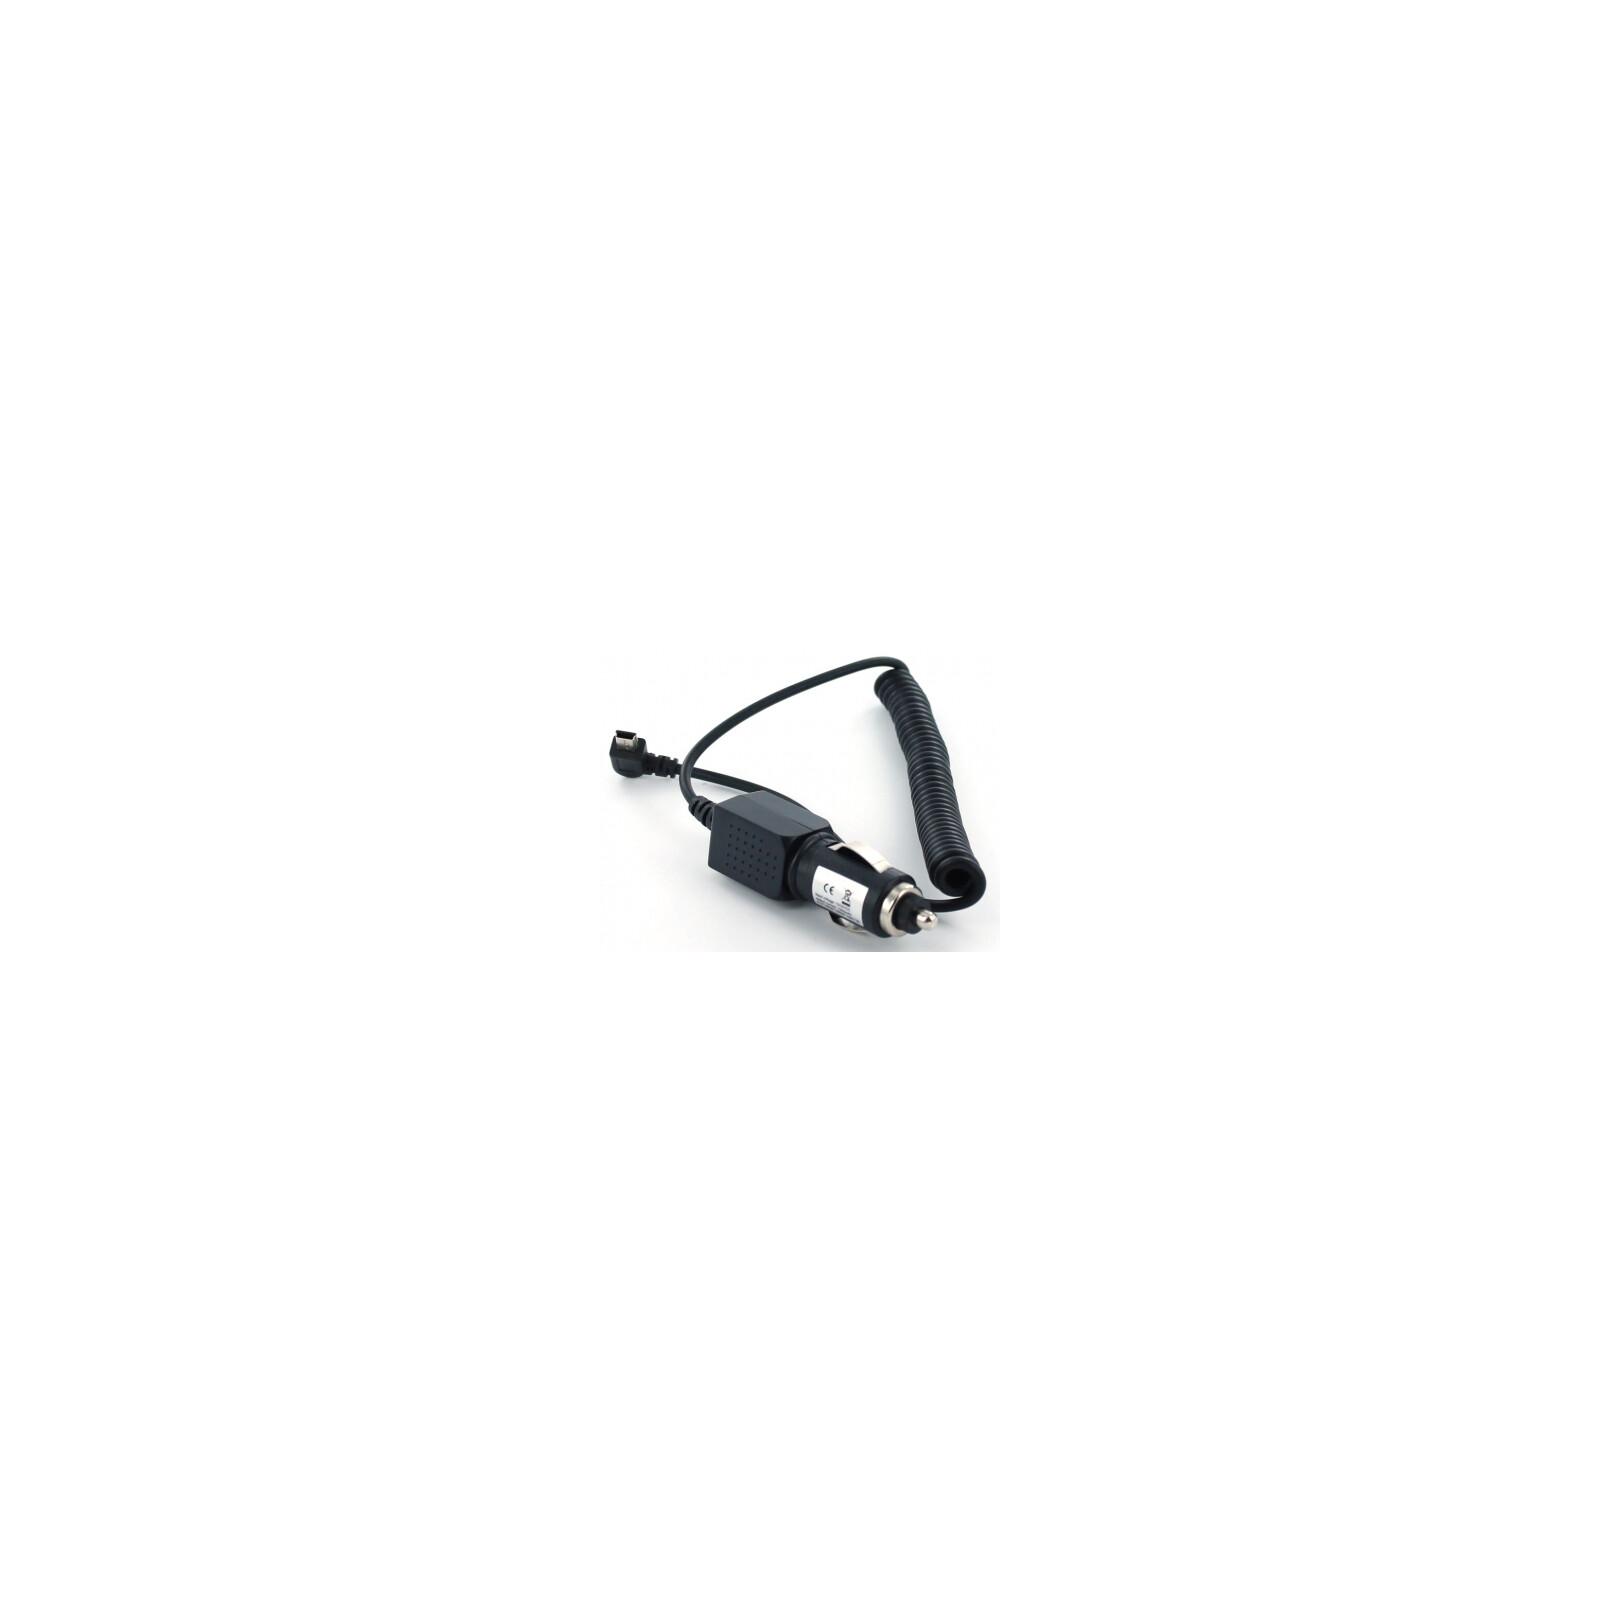 AGI KFZ-Ladekabel Garmin Streetpilot C330 5W